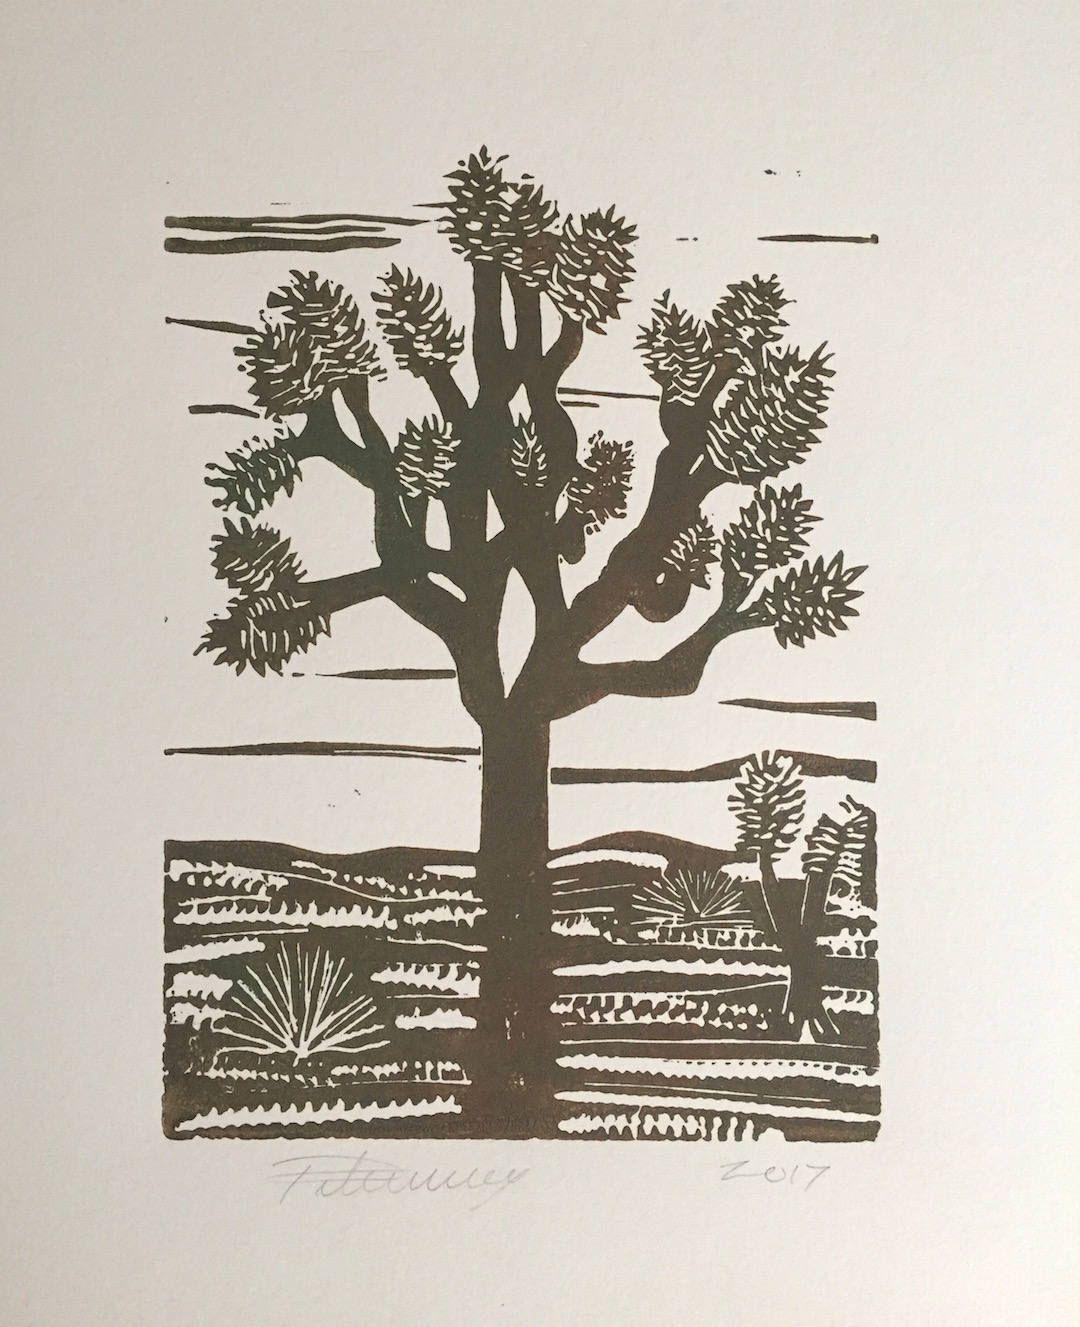 Muddy Brown Green Joshua Tree by PaulaTiberius on Etsy https://www.etsy.com/listing/556839333/muddy-brown-green-joshua-tree